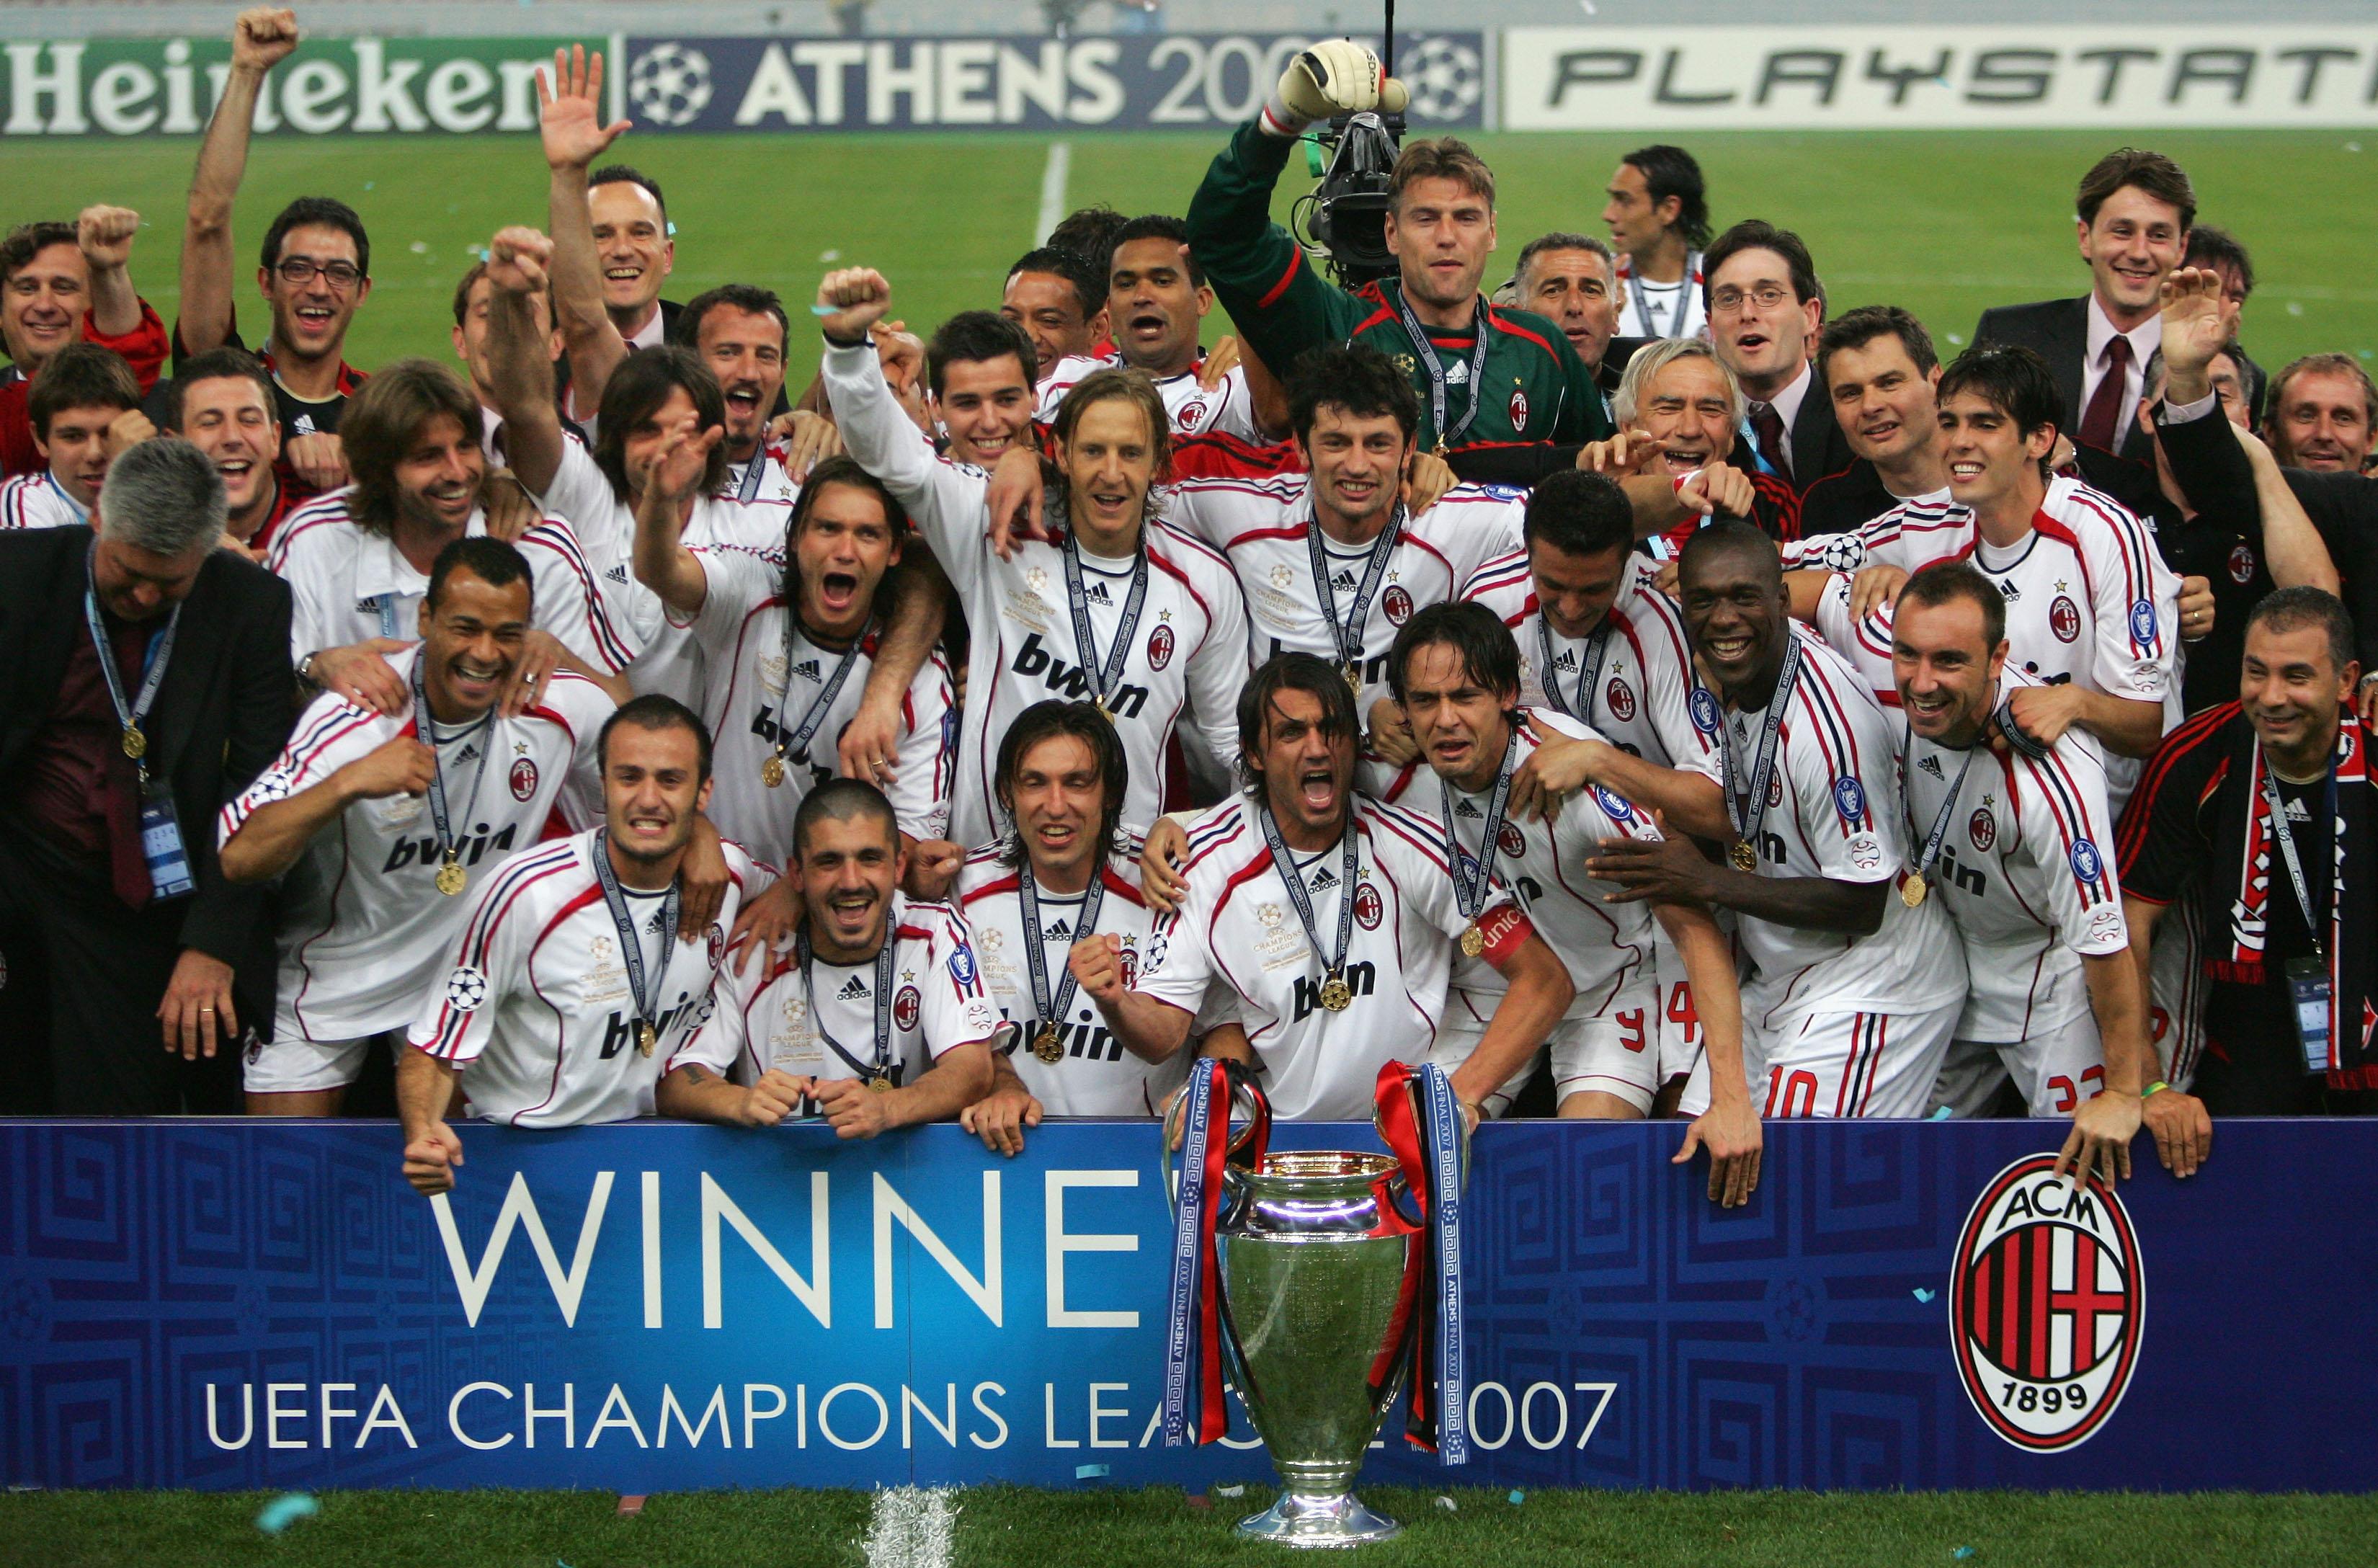 milan uefa champions league 2007 - photo#5